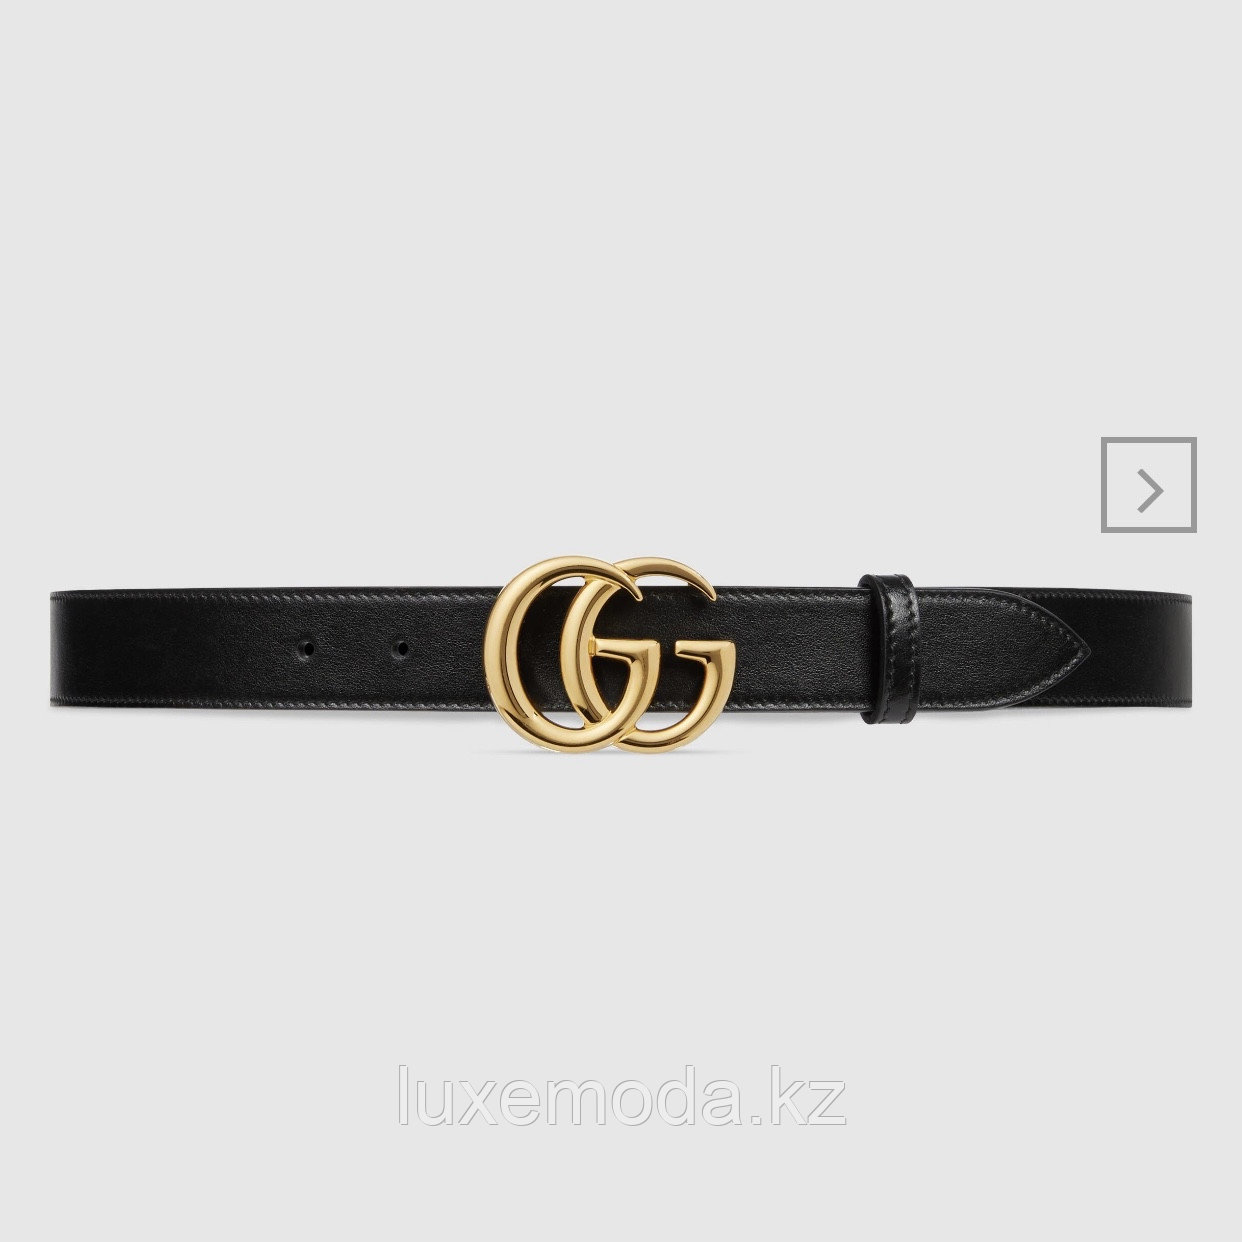 Ремень Gucci GG Marmont-узкий.